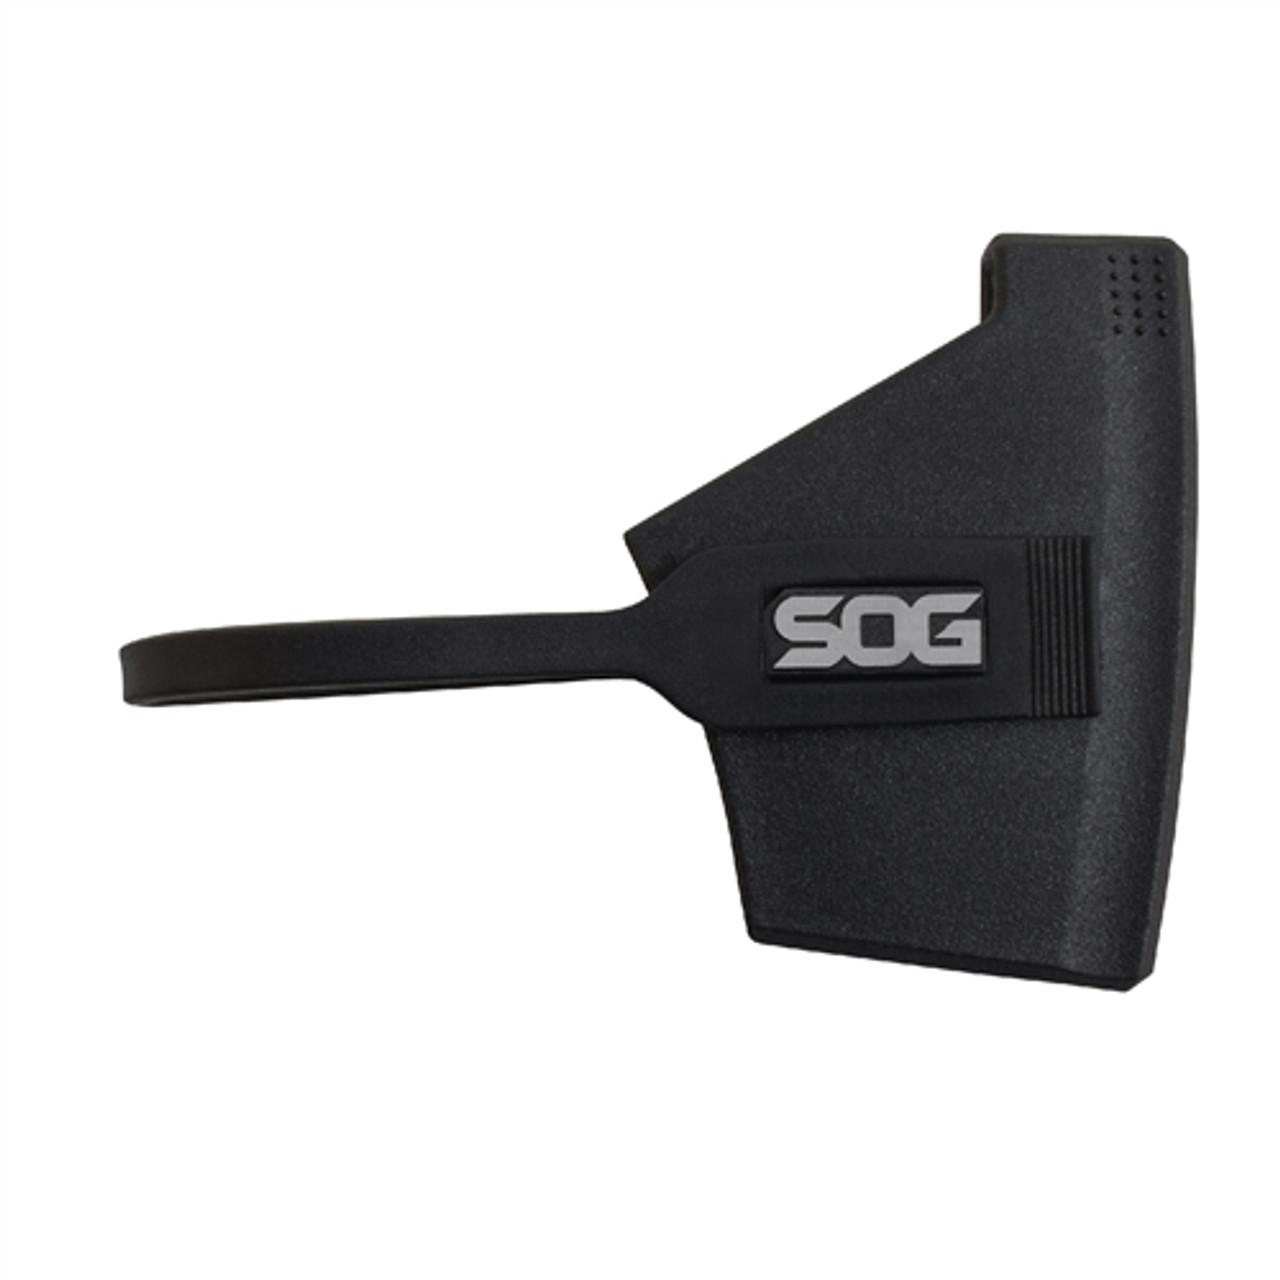 SOG CH-1001 Camp Axe Fixed Blade Knife, Satin Blade